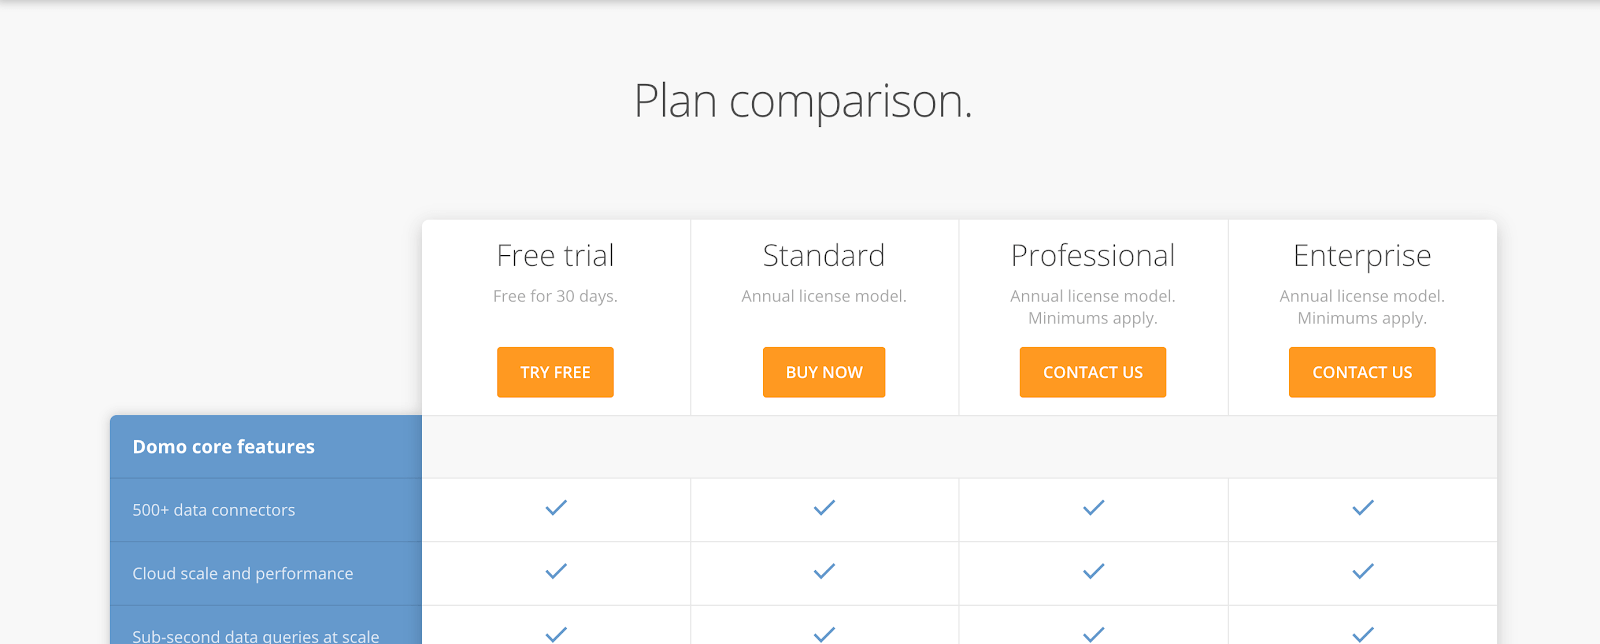 Domo's plan comparison